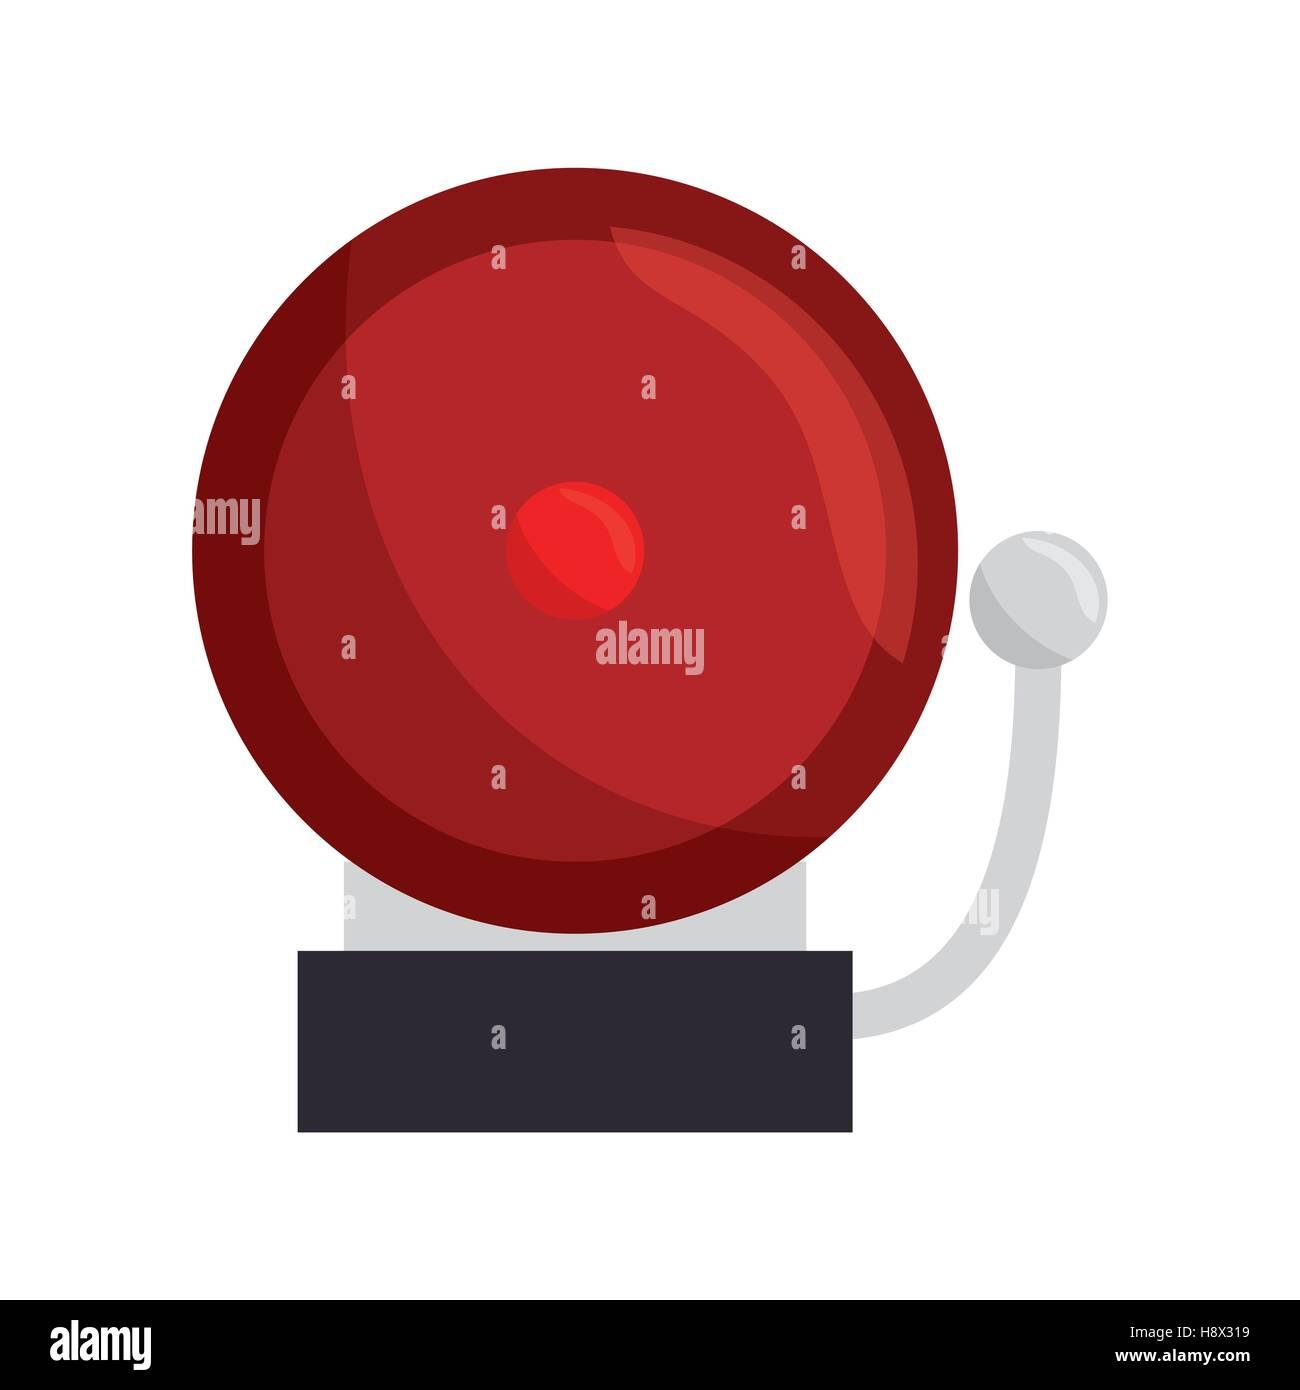 ring school alarm icon vector illustration design - Stock Image